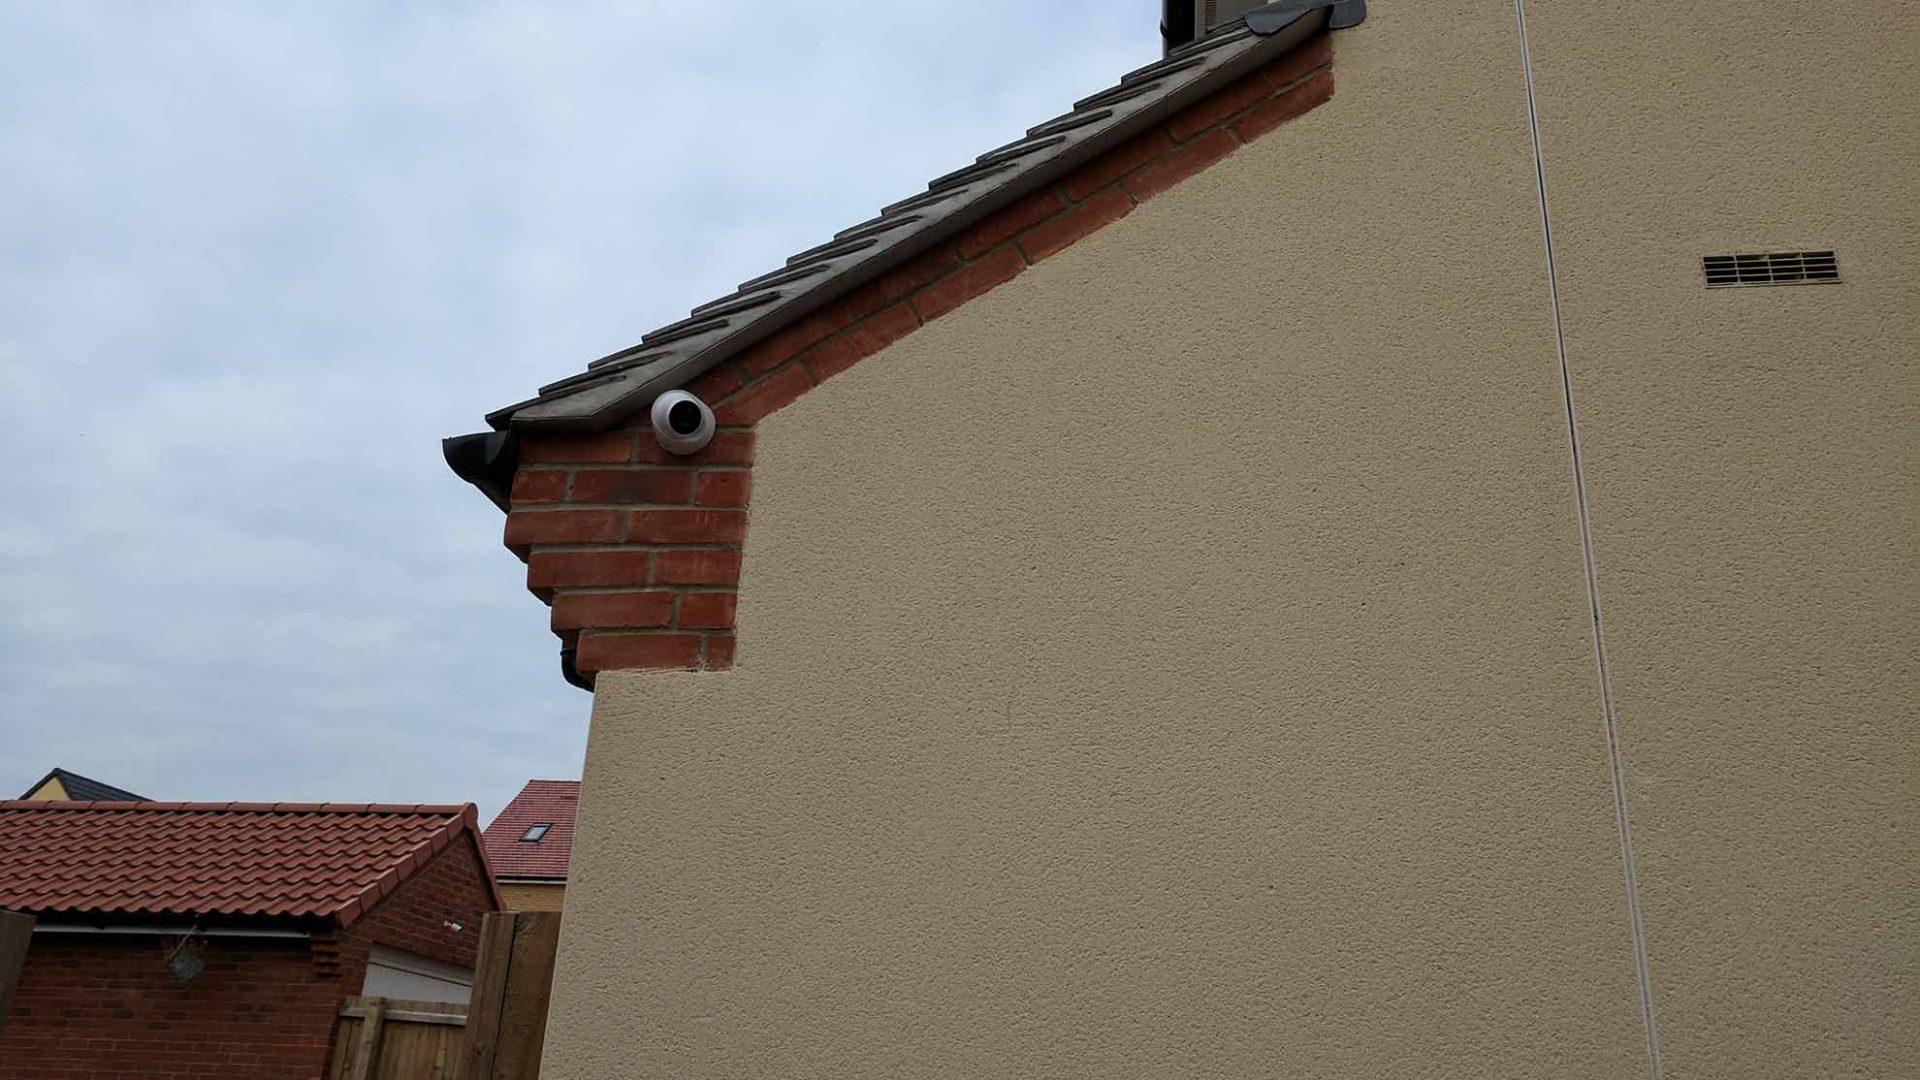 CCTV Installation Bloor Homes Laindon, Essex